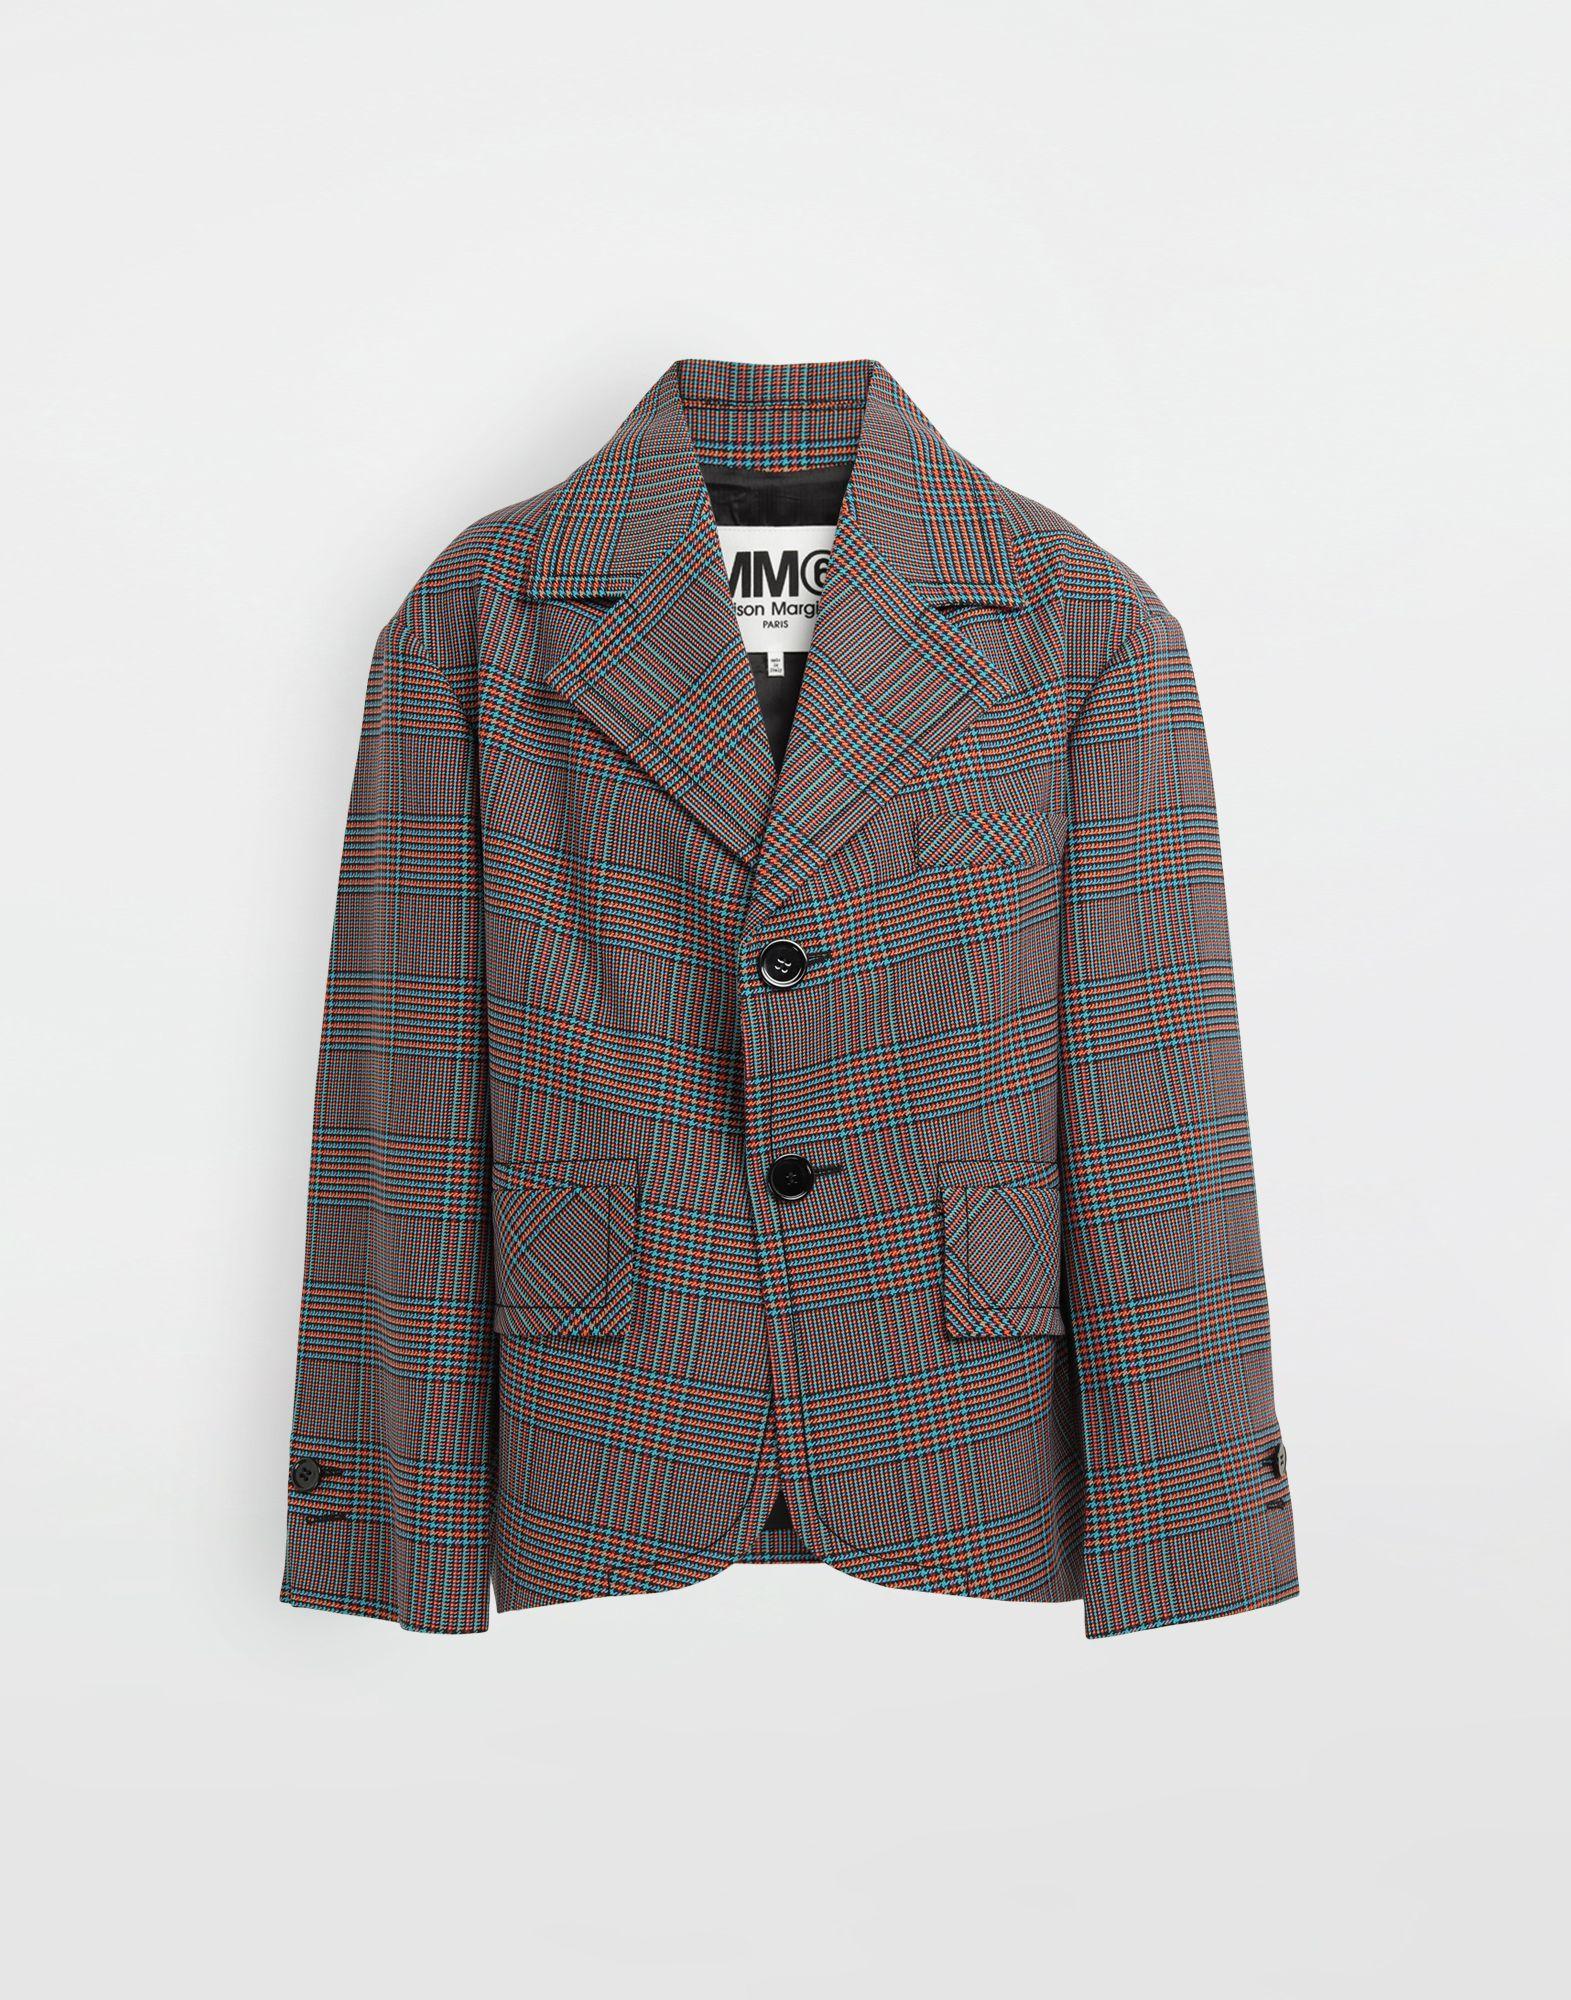 MM6 MAISON MARGIELA Oversized checked wool jacket Blazer Woman f